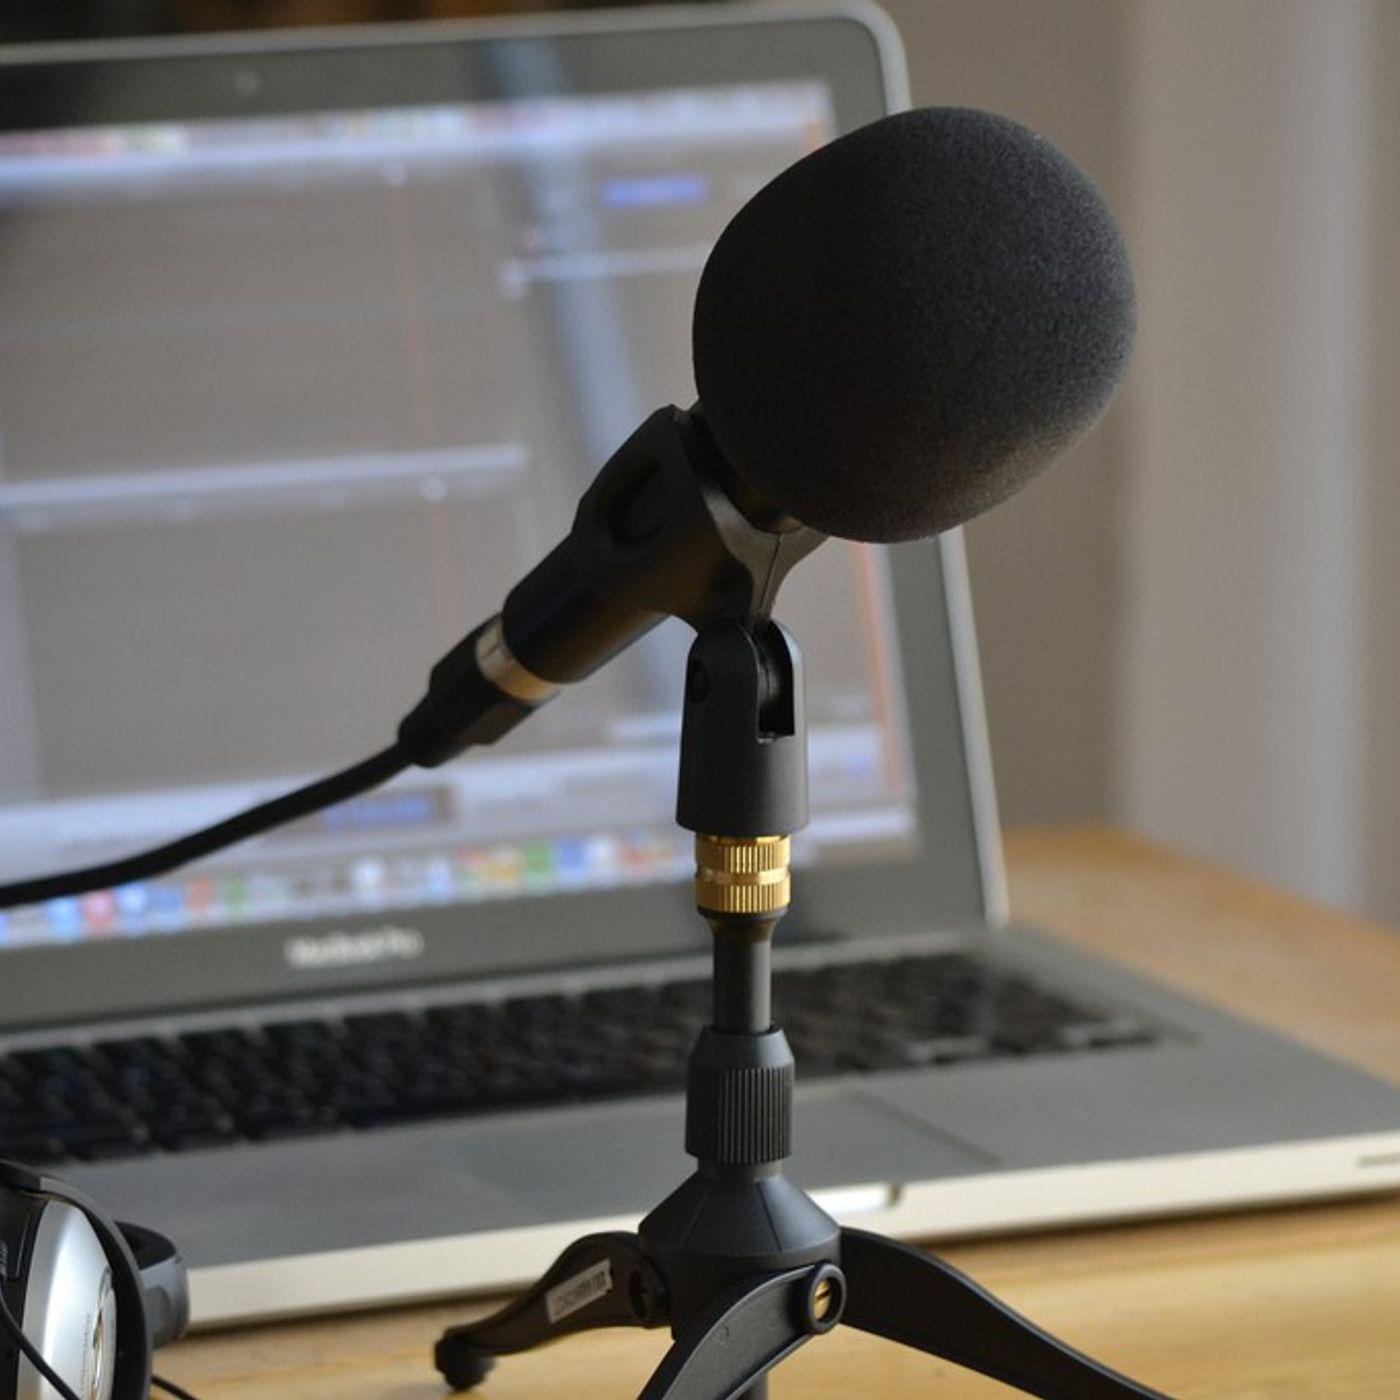 Podcasting Audible and Edifi